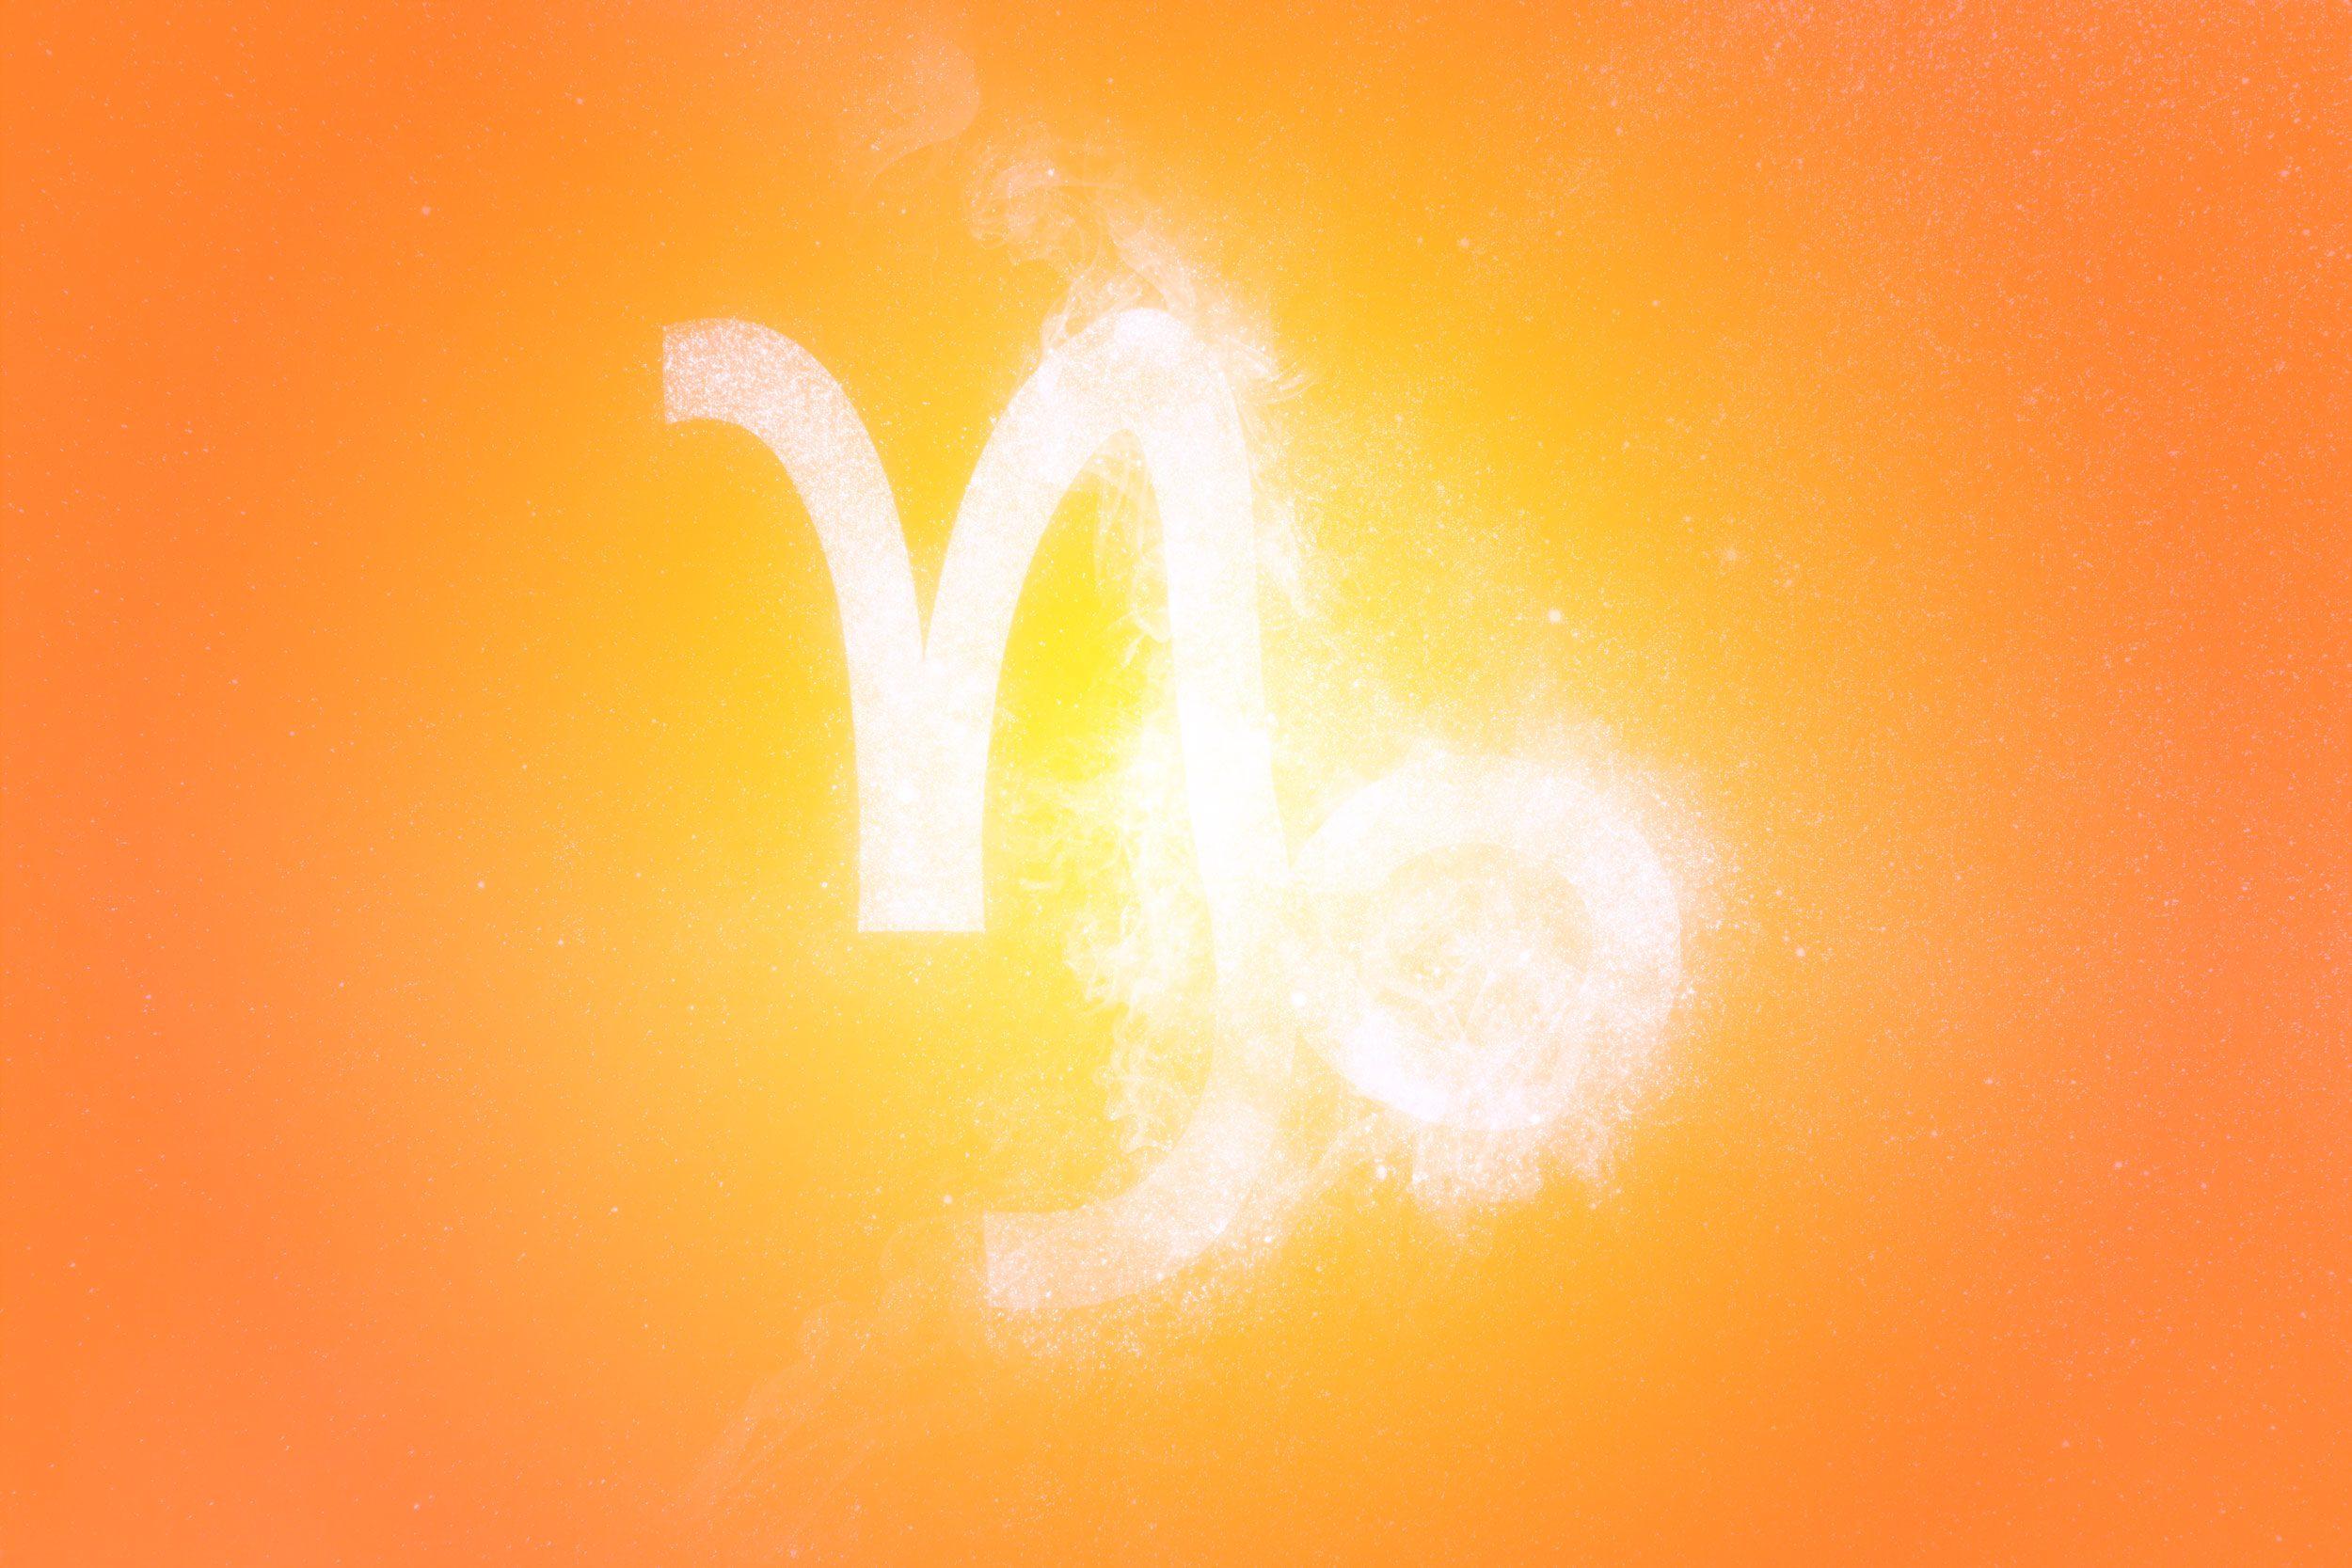 Capricorn Zodiac Sign. Abstract sky background